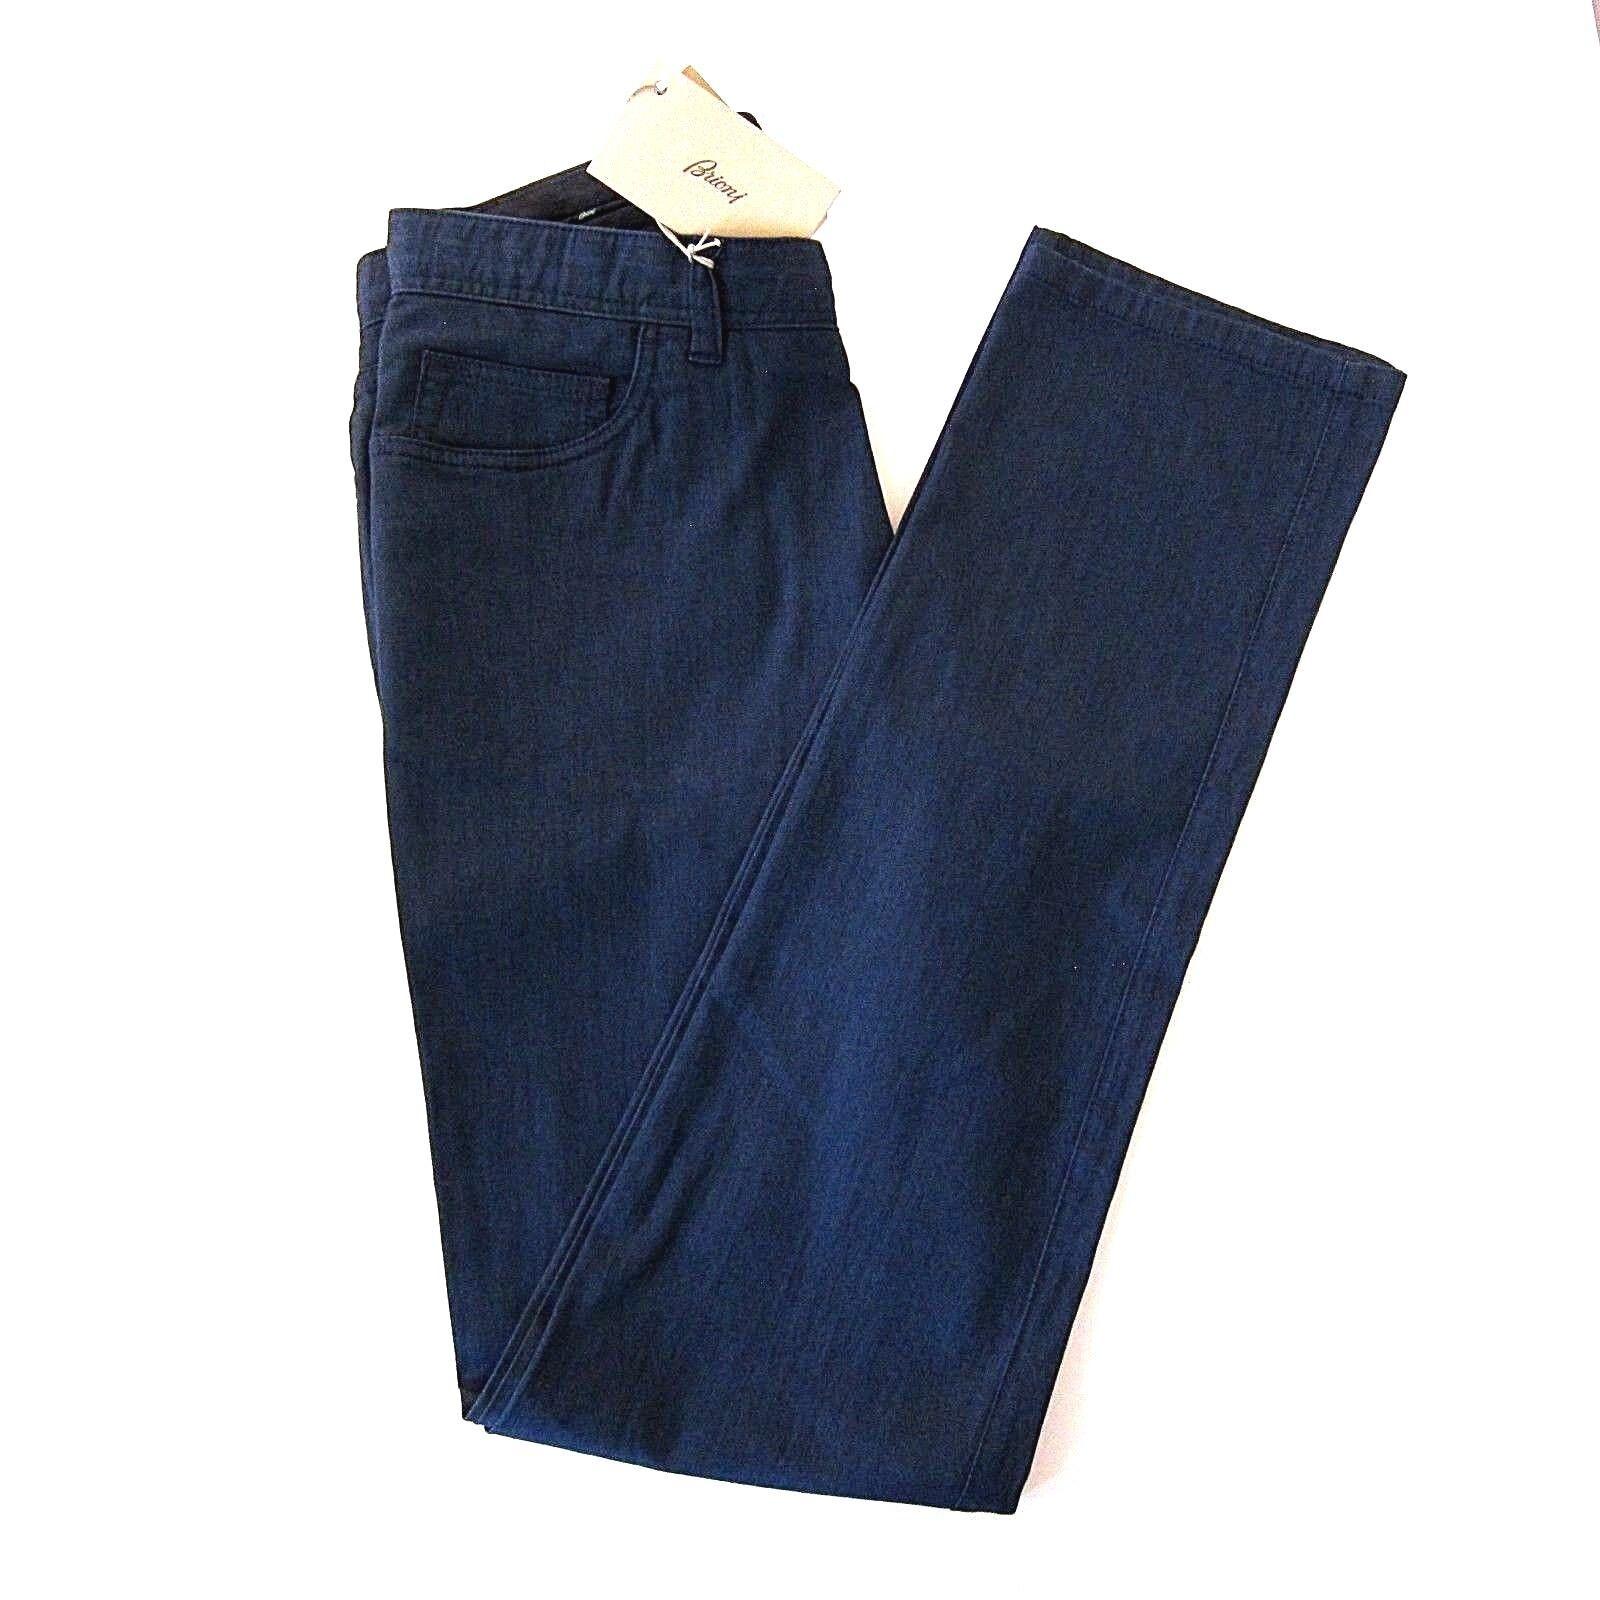 e88b9c2abffa0d J-3010114 Neu Brioni Mitternacht Blau Jeans Hose Hose Hose Größe Us 32  3fa68c